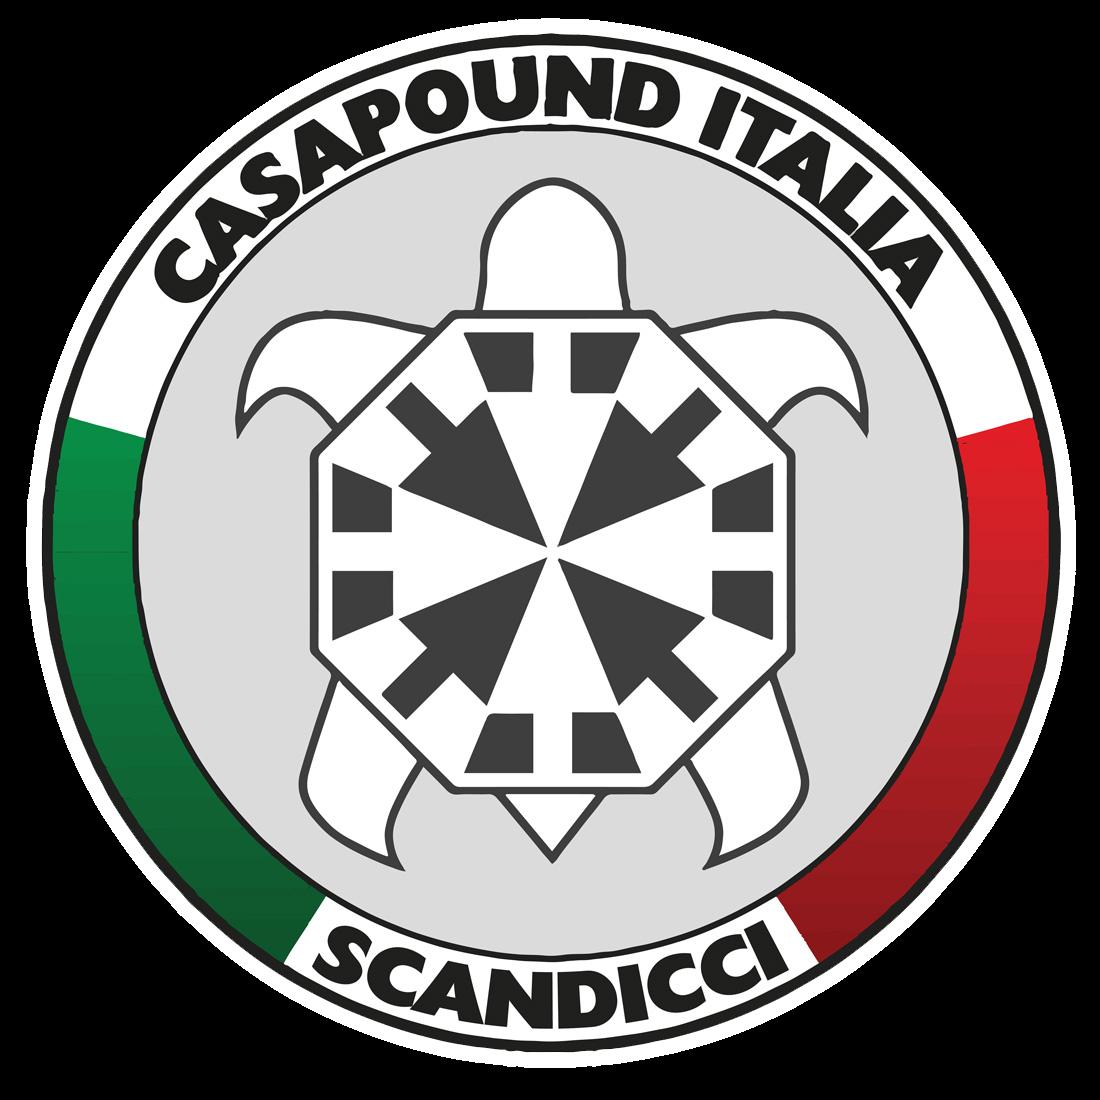 CasaPoud Italia Scandicci